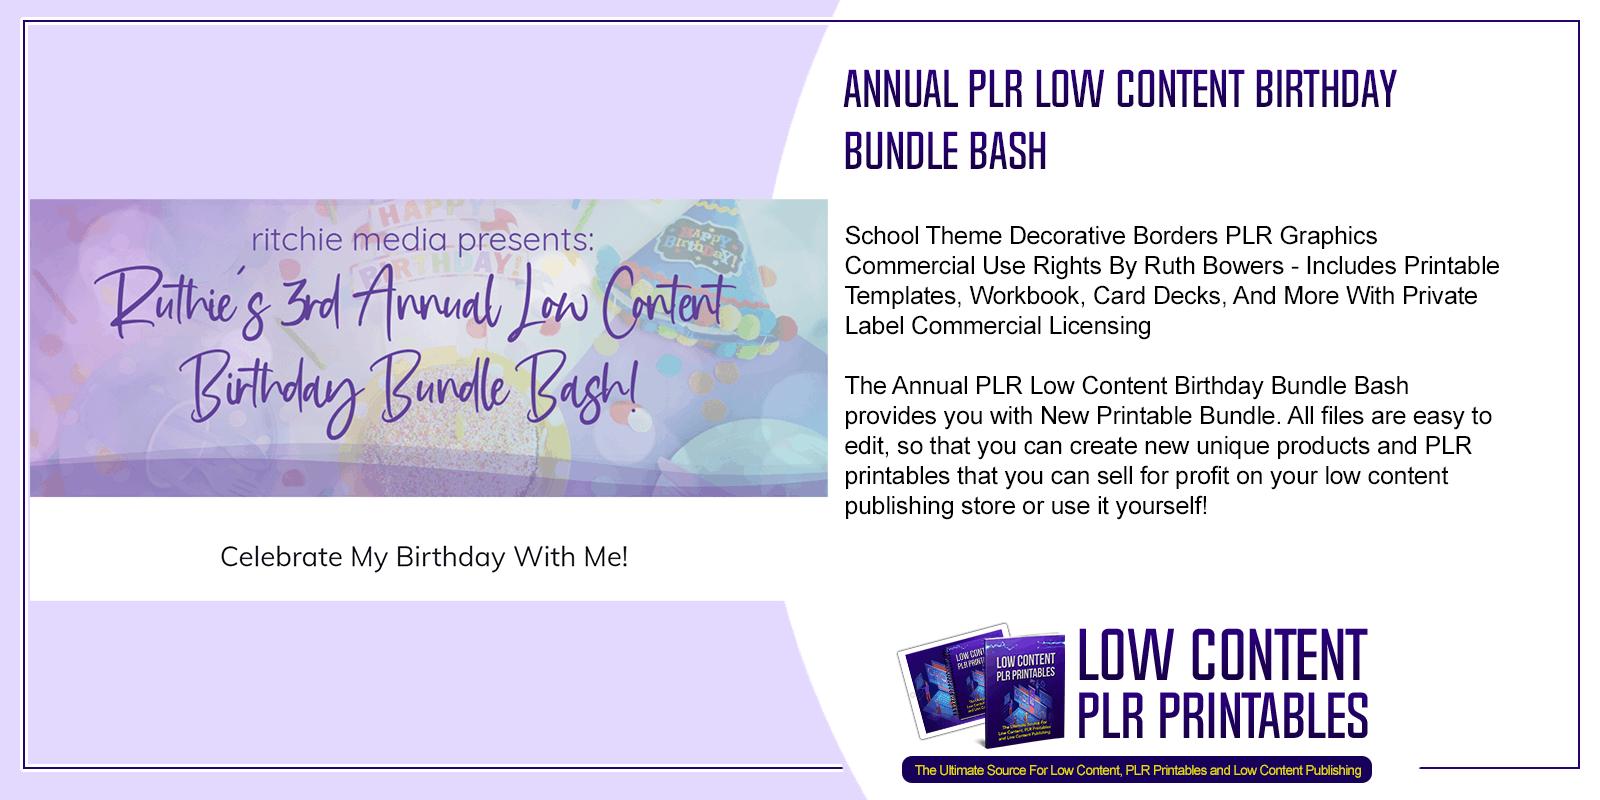 Annual PLR Low Content Birthday Bundle Bash